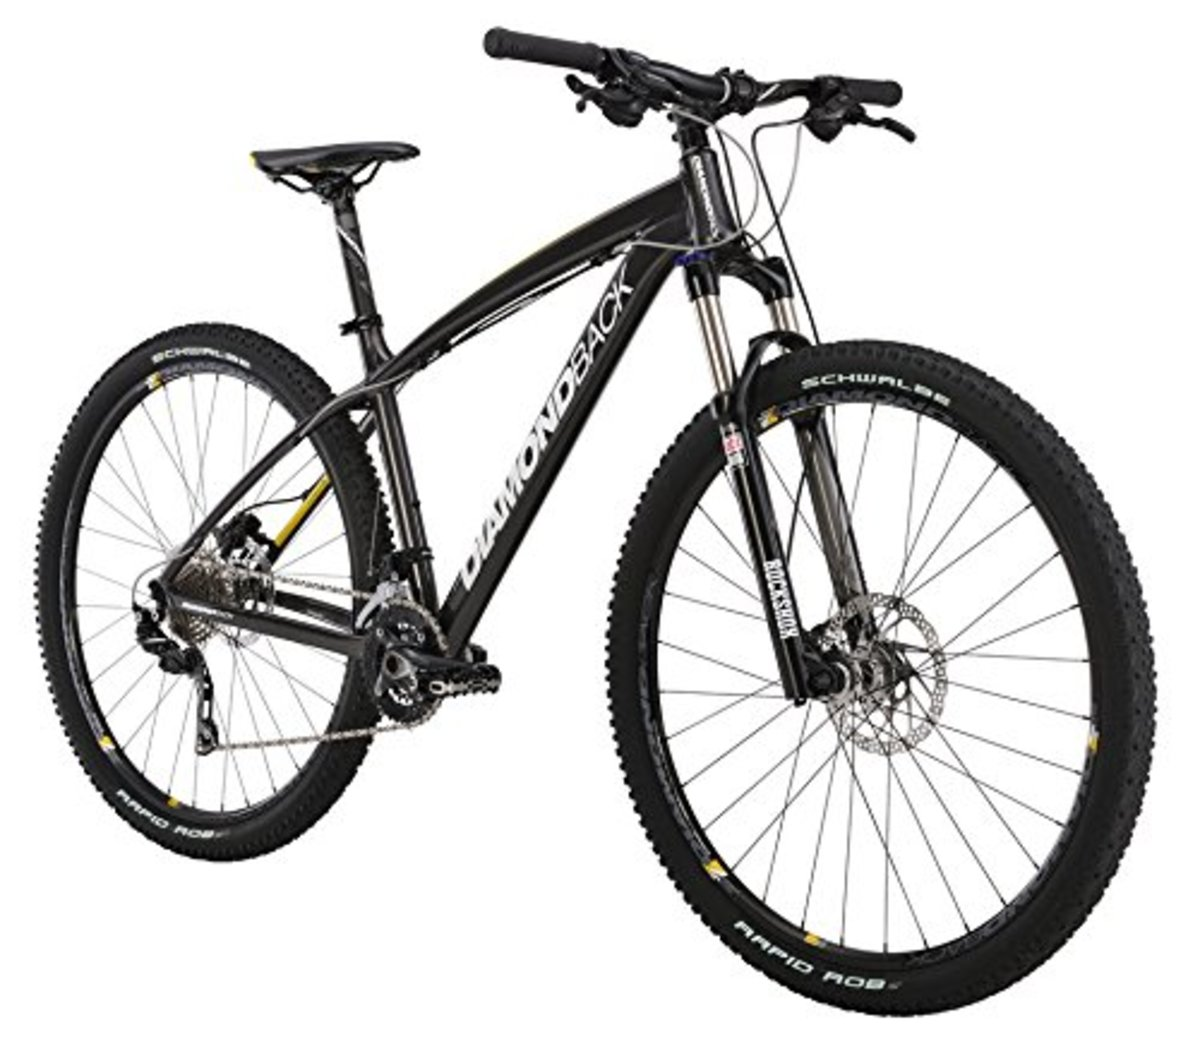 Diamondback Bicycles 2015 Overdrive Comp hardtail mountain bike.